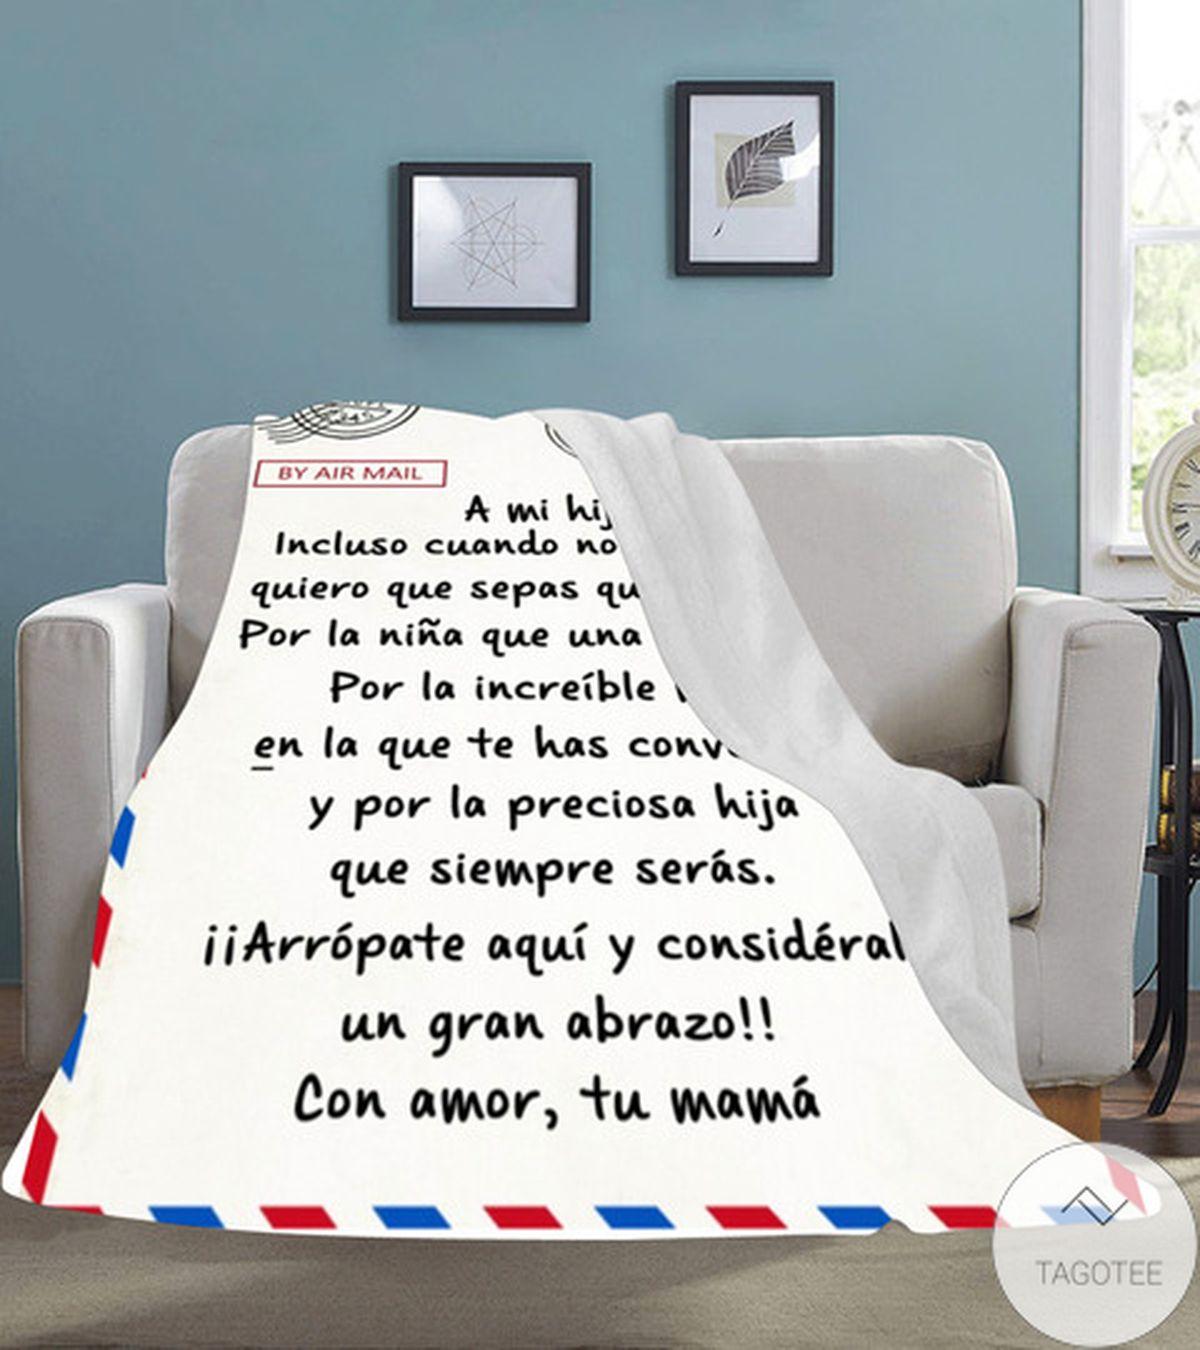 By Air Mail A Mi Hija Com Amor Tu Mama Fleece Blanketz